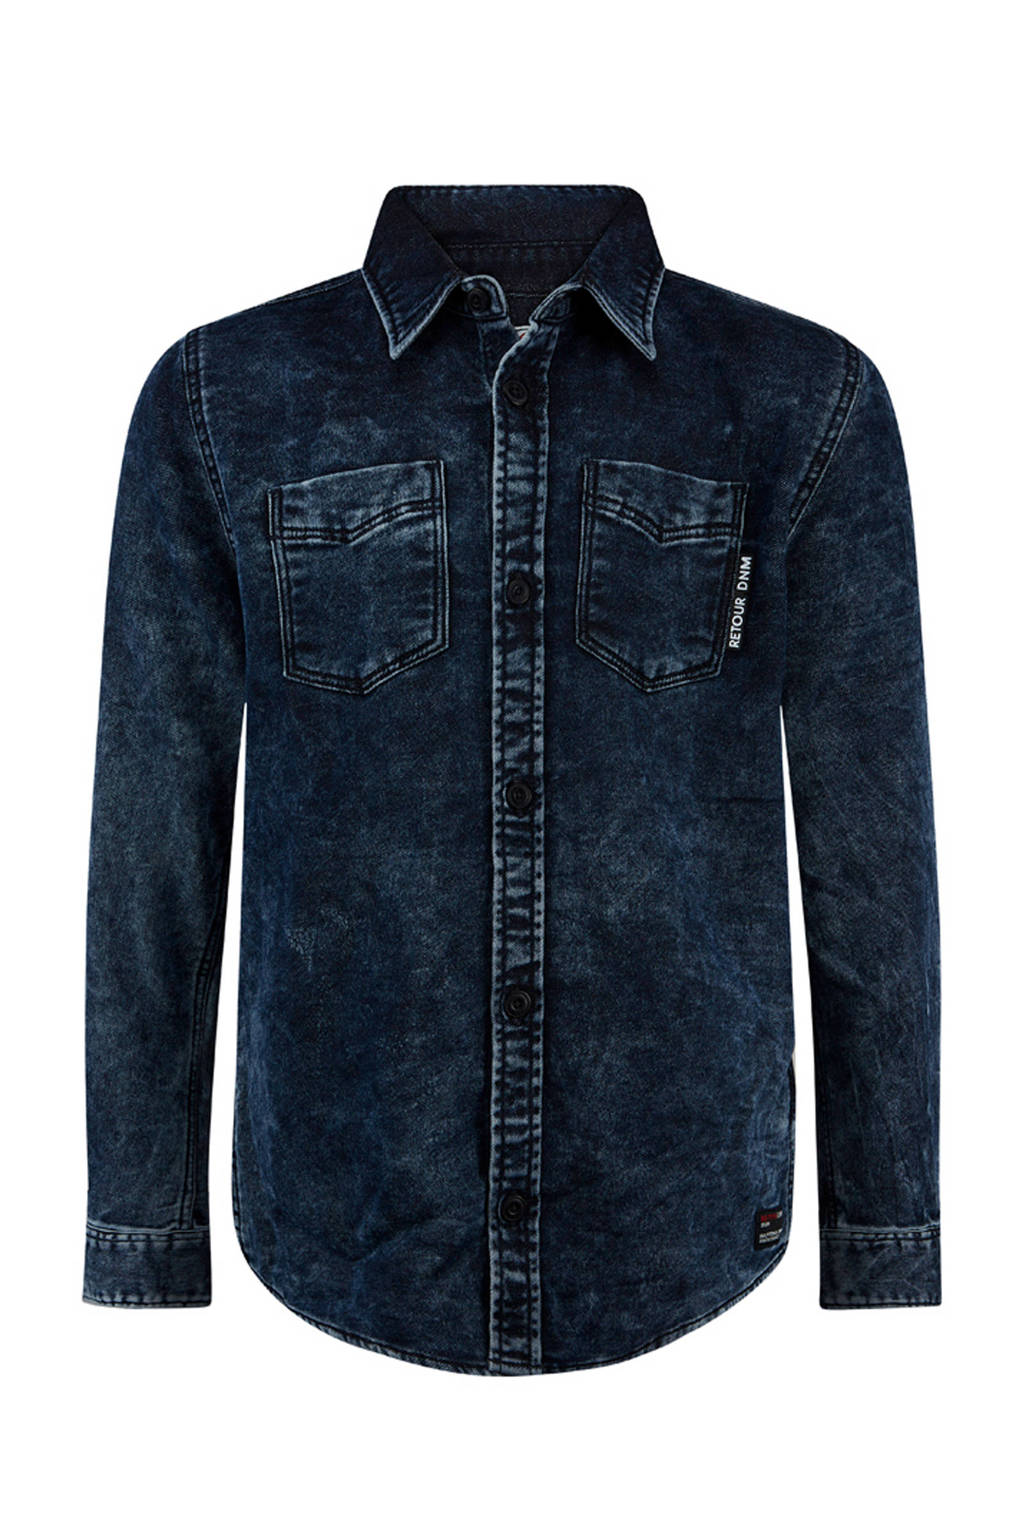 Retour Denim overhemd Sjors indigo blauw, Indigo blauw